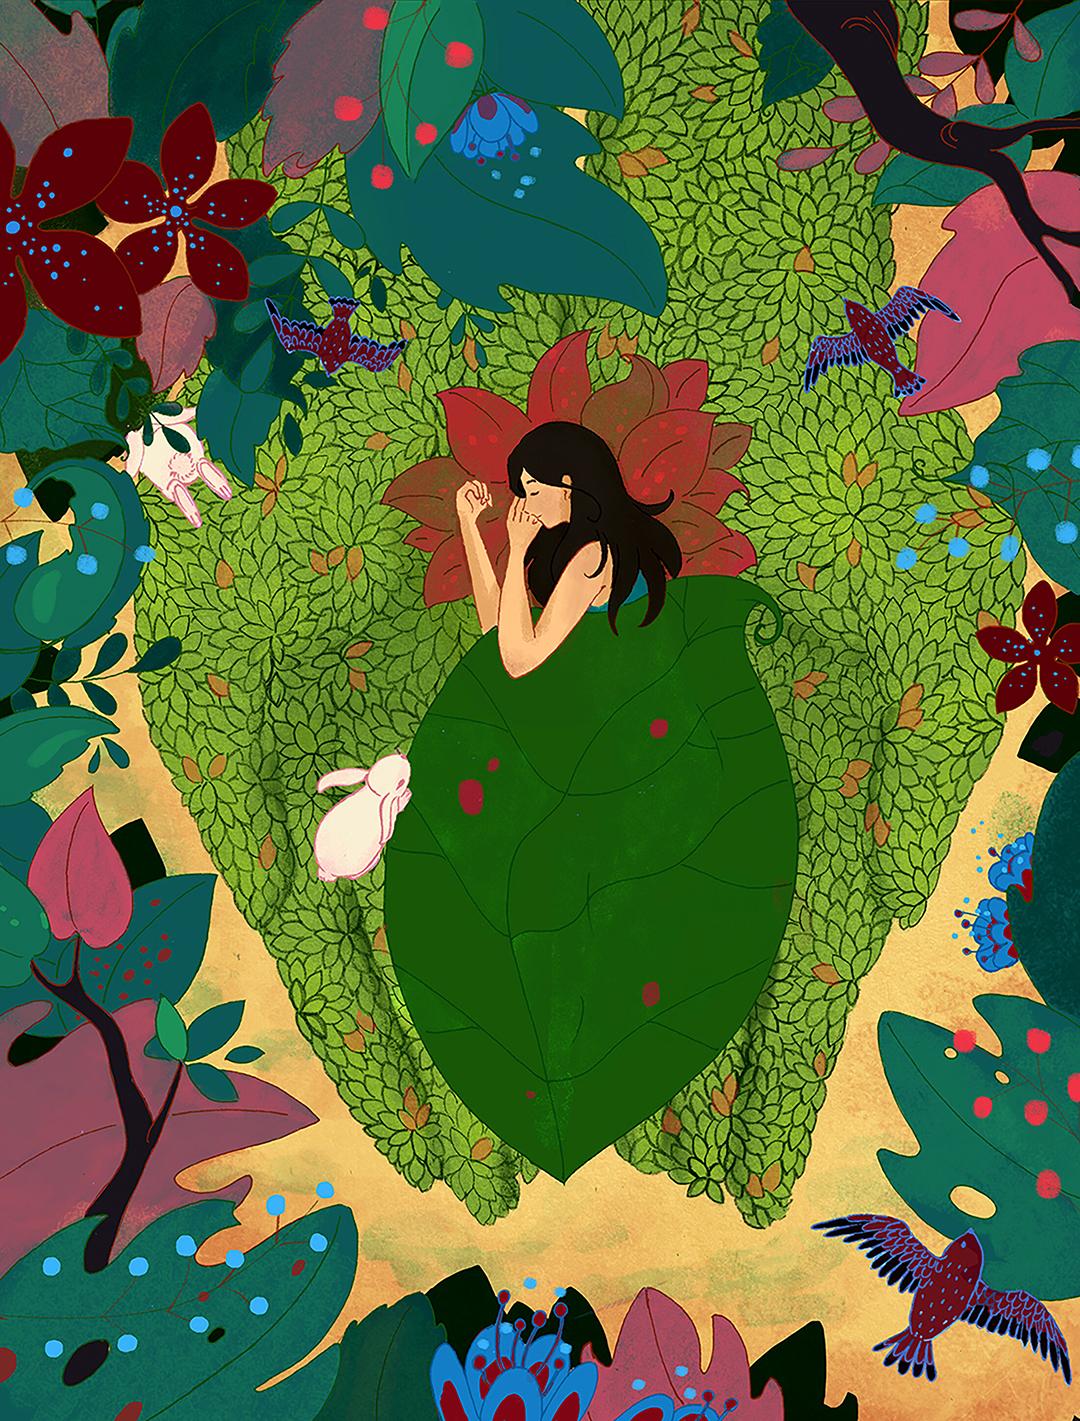 GirlsclubAsia-Illustrator-Shreya-Gupta-NewYork-India-Wildest+dreams